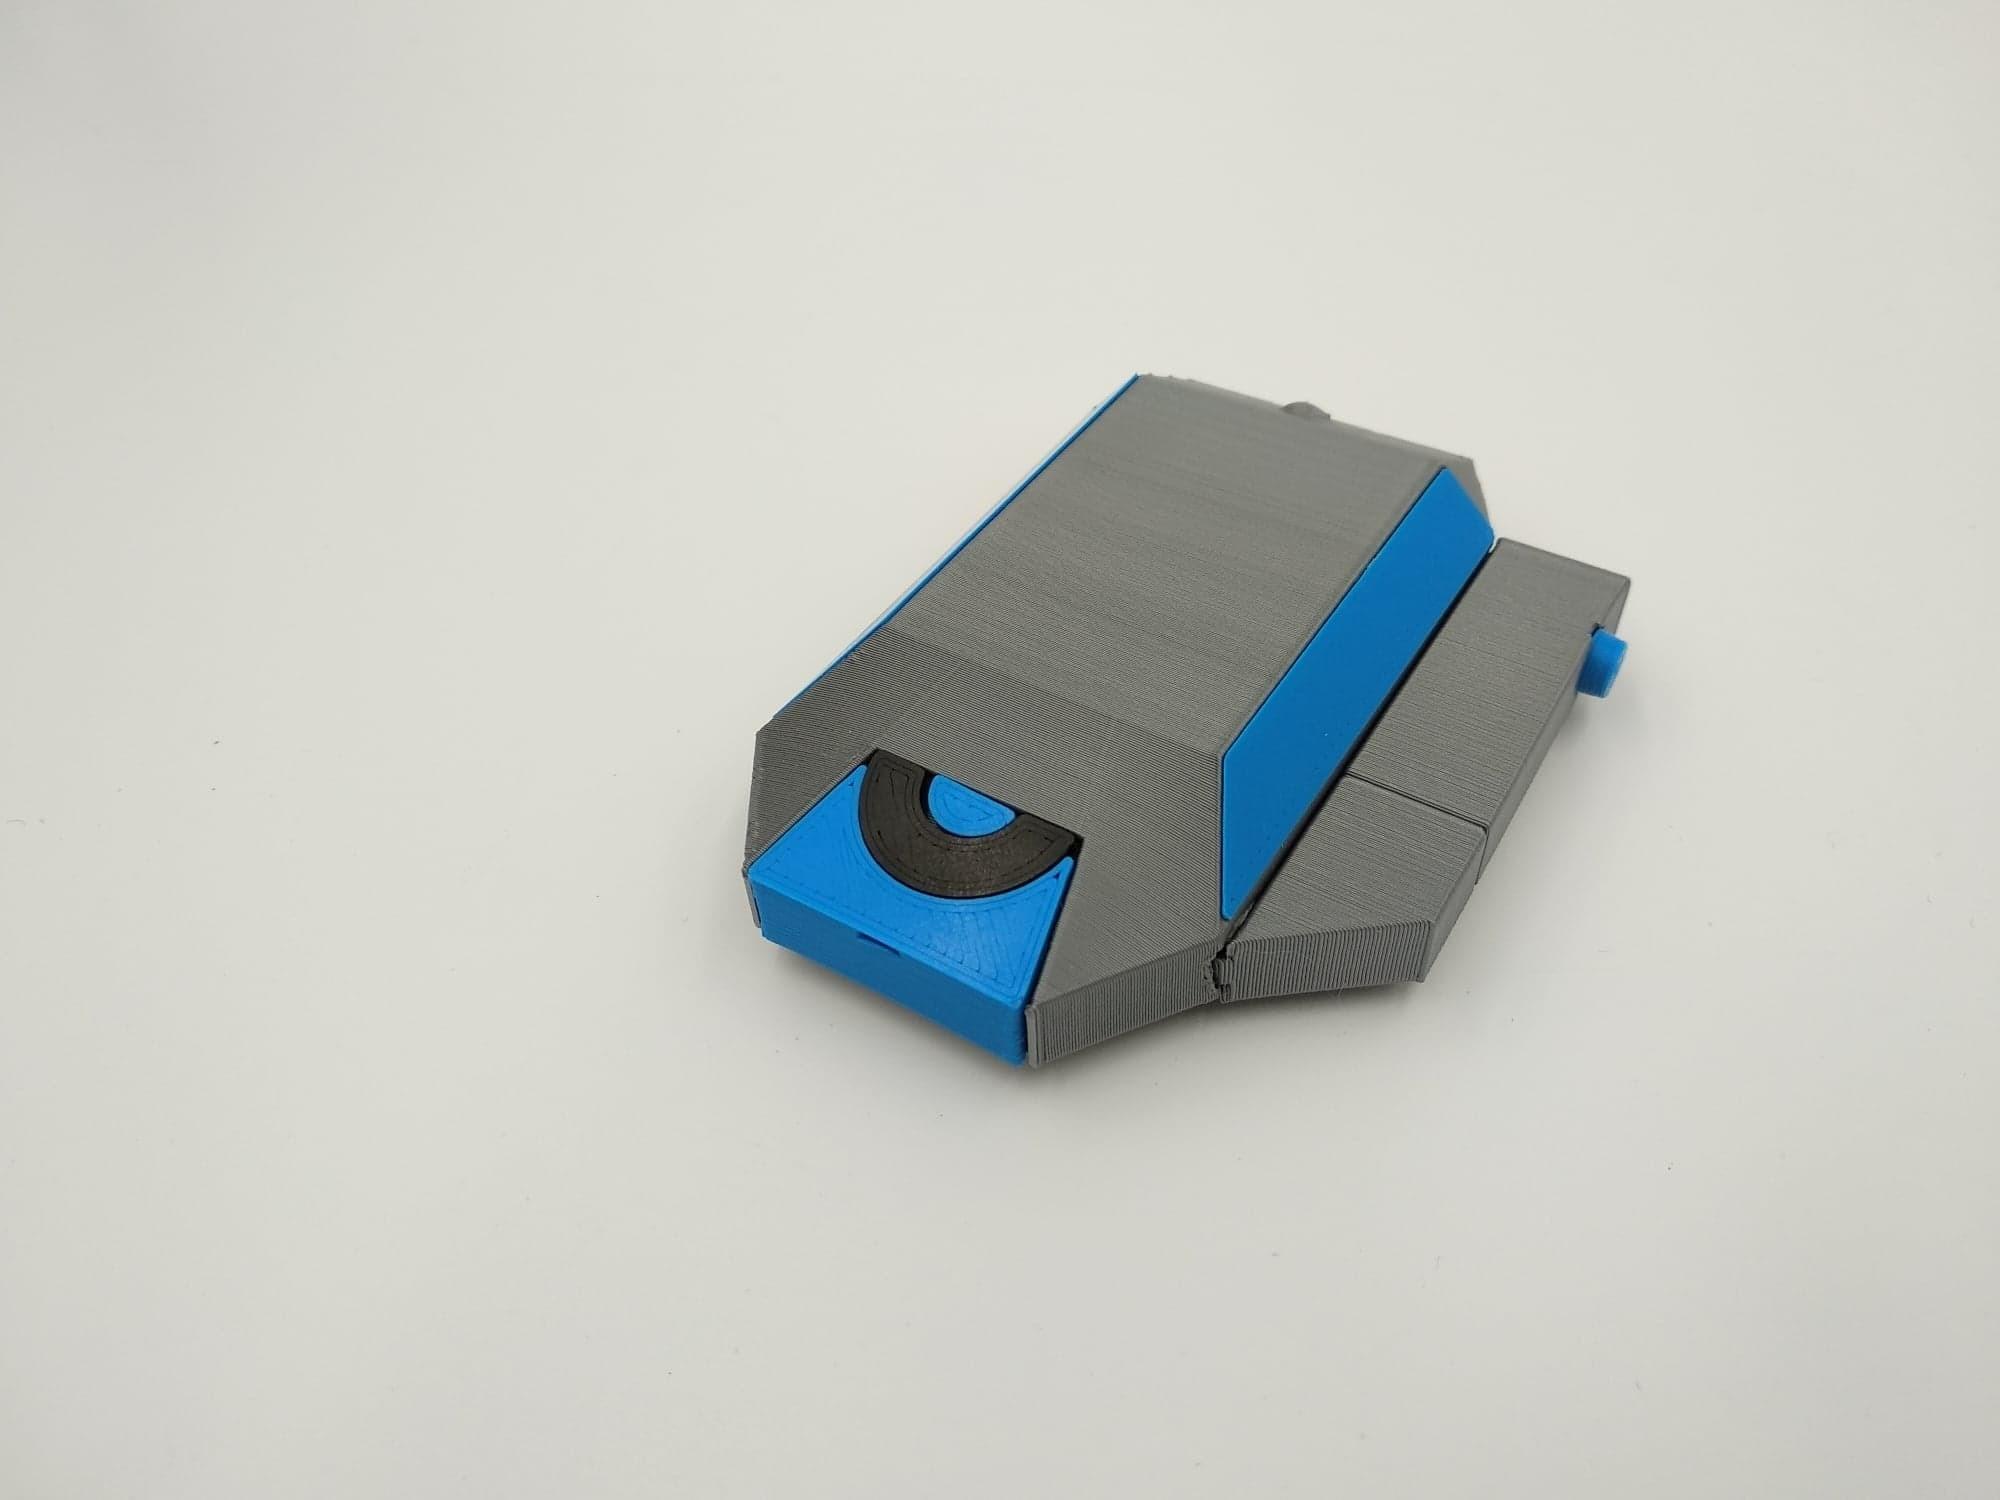 36338186_236334890490578_2614356664773509120_n.jpg Download STL file Pokemon Xtransceiver 3D print model • 3D print model, 3D-mon